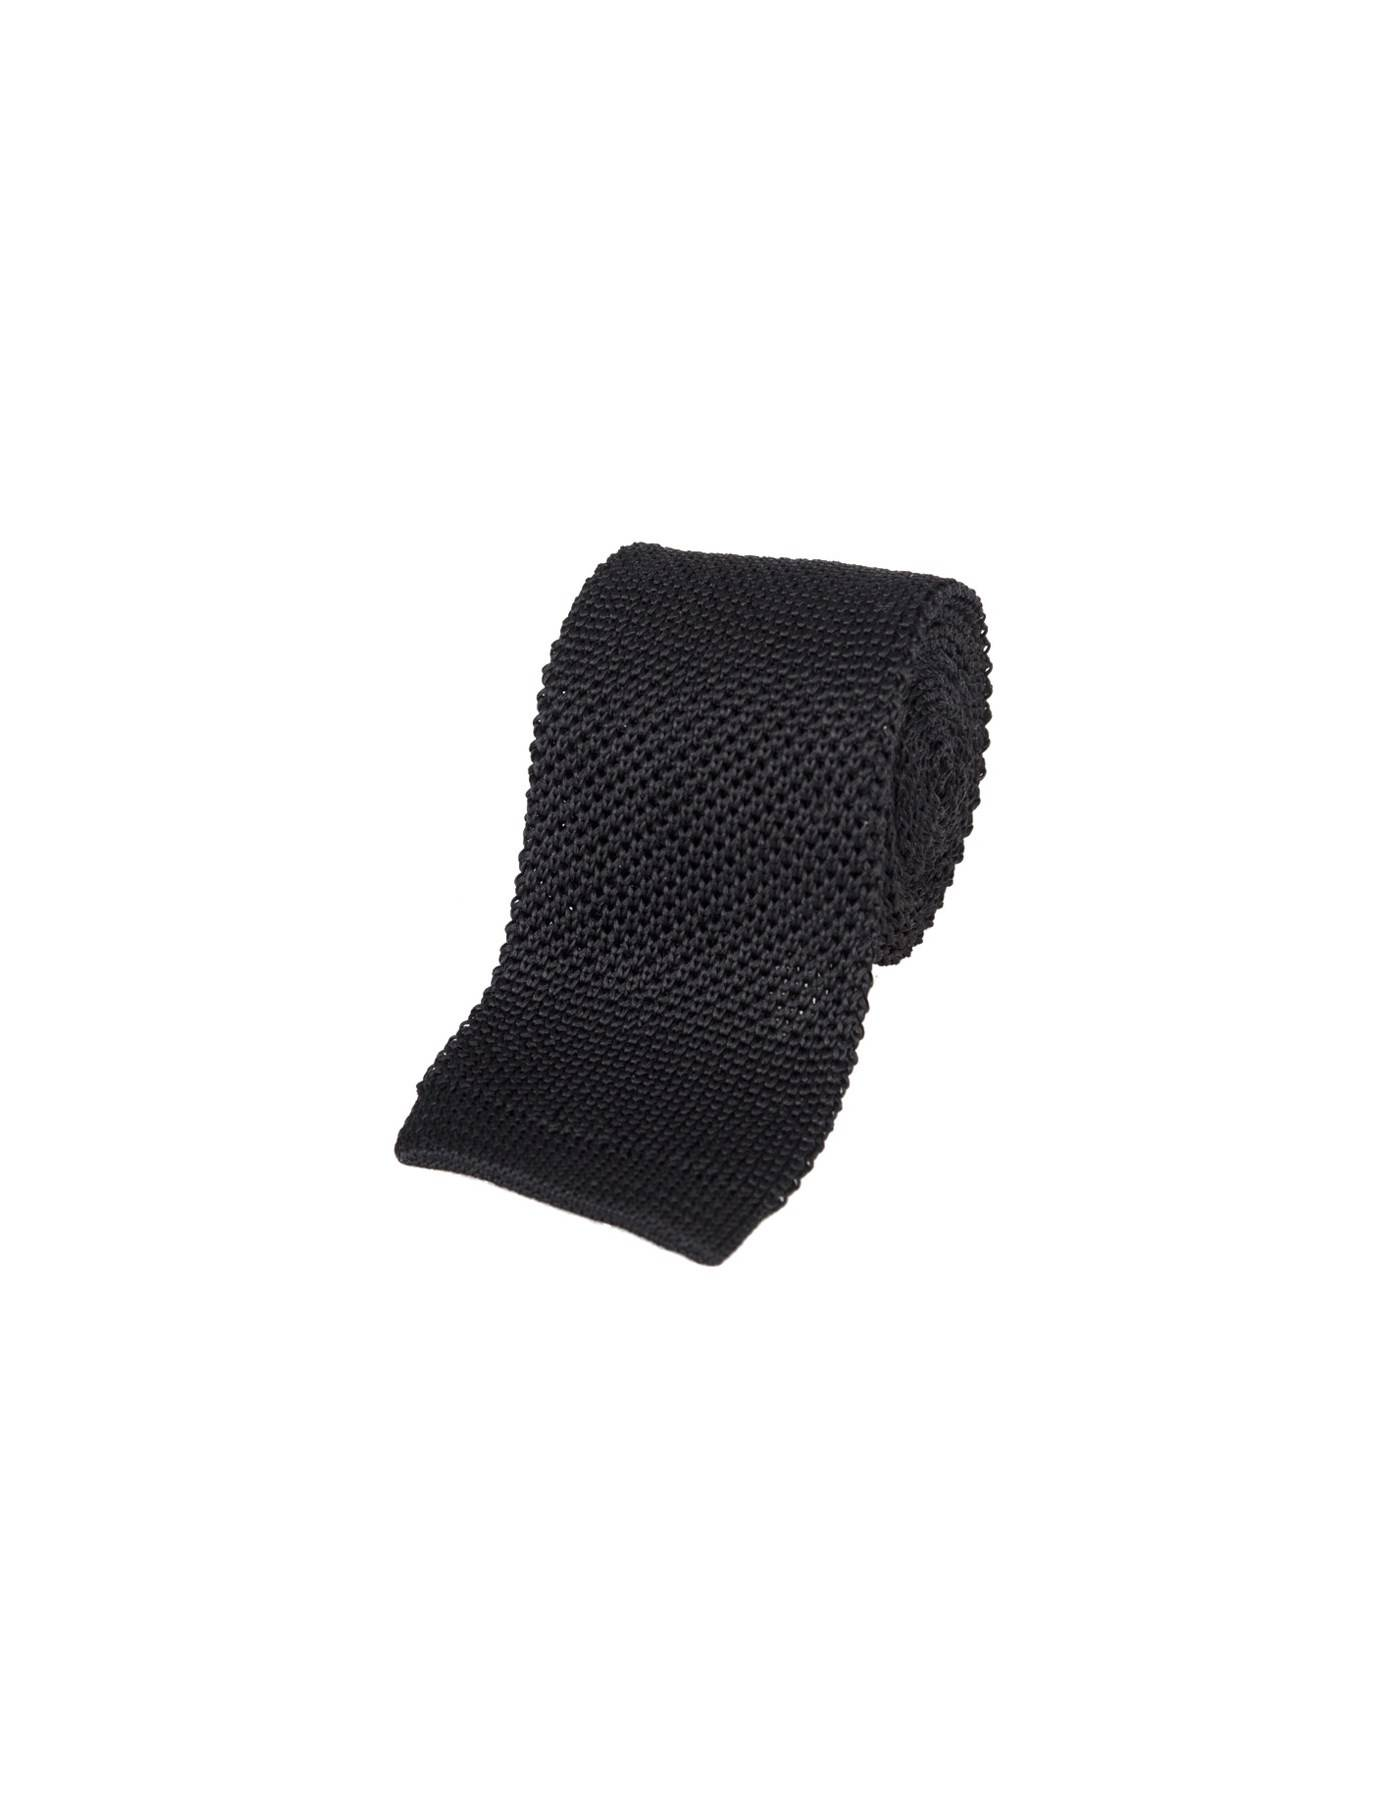 Hawes & Curtis Men's Knitted Tie in Black 100% Silk Hawes & Curtis